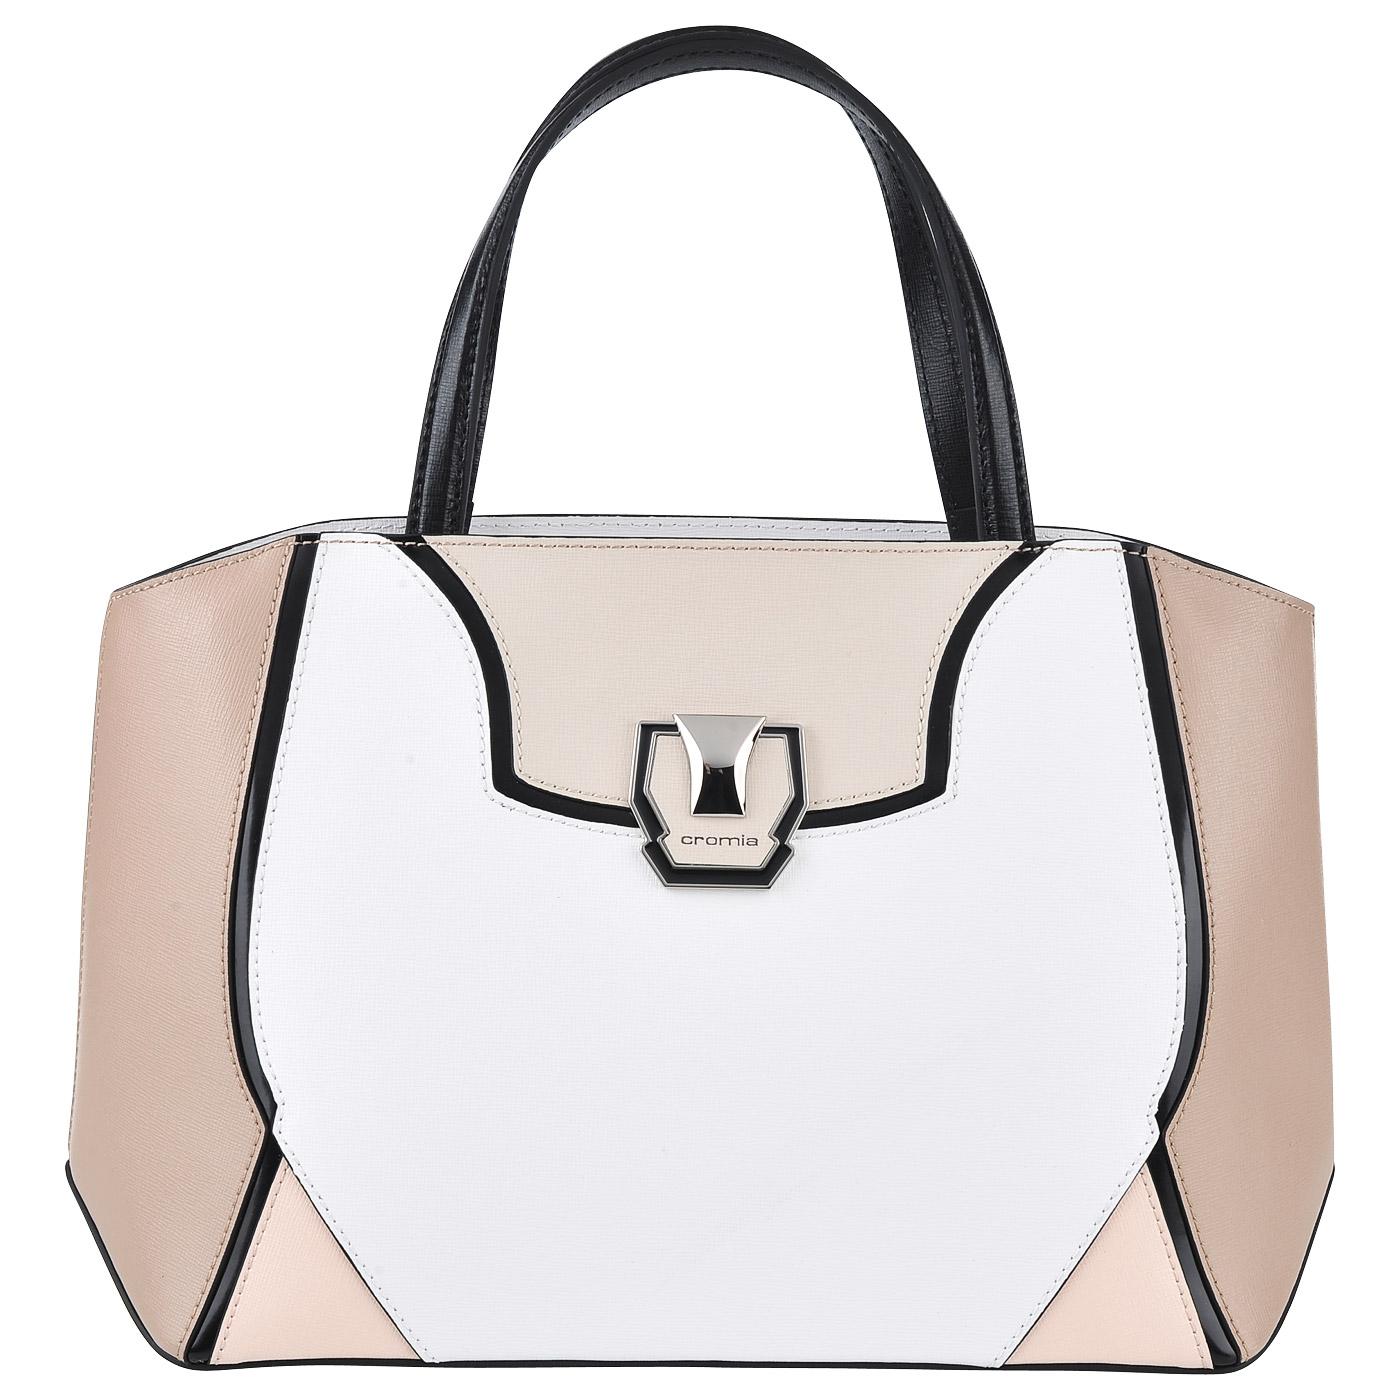 31df0658cee3 Женская кожаная сумка Cromia Lara Женская кожаная сумка Cromia Lara ...